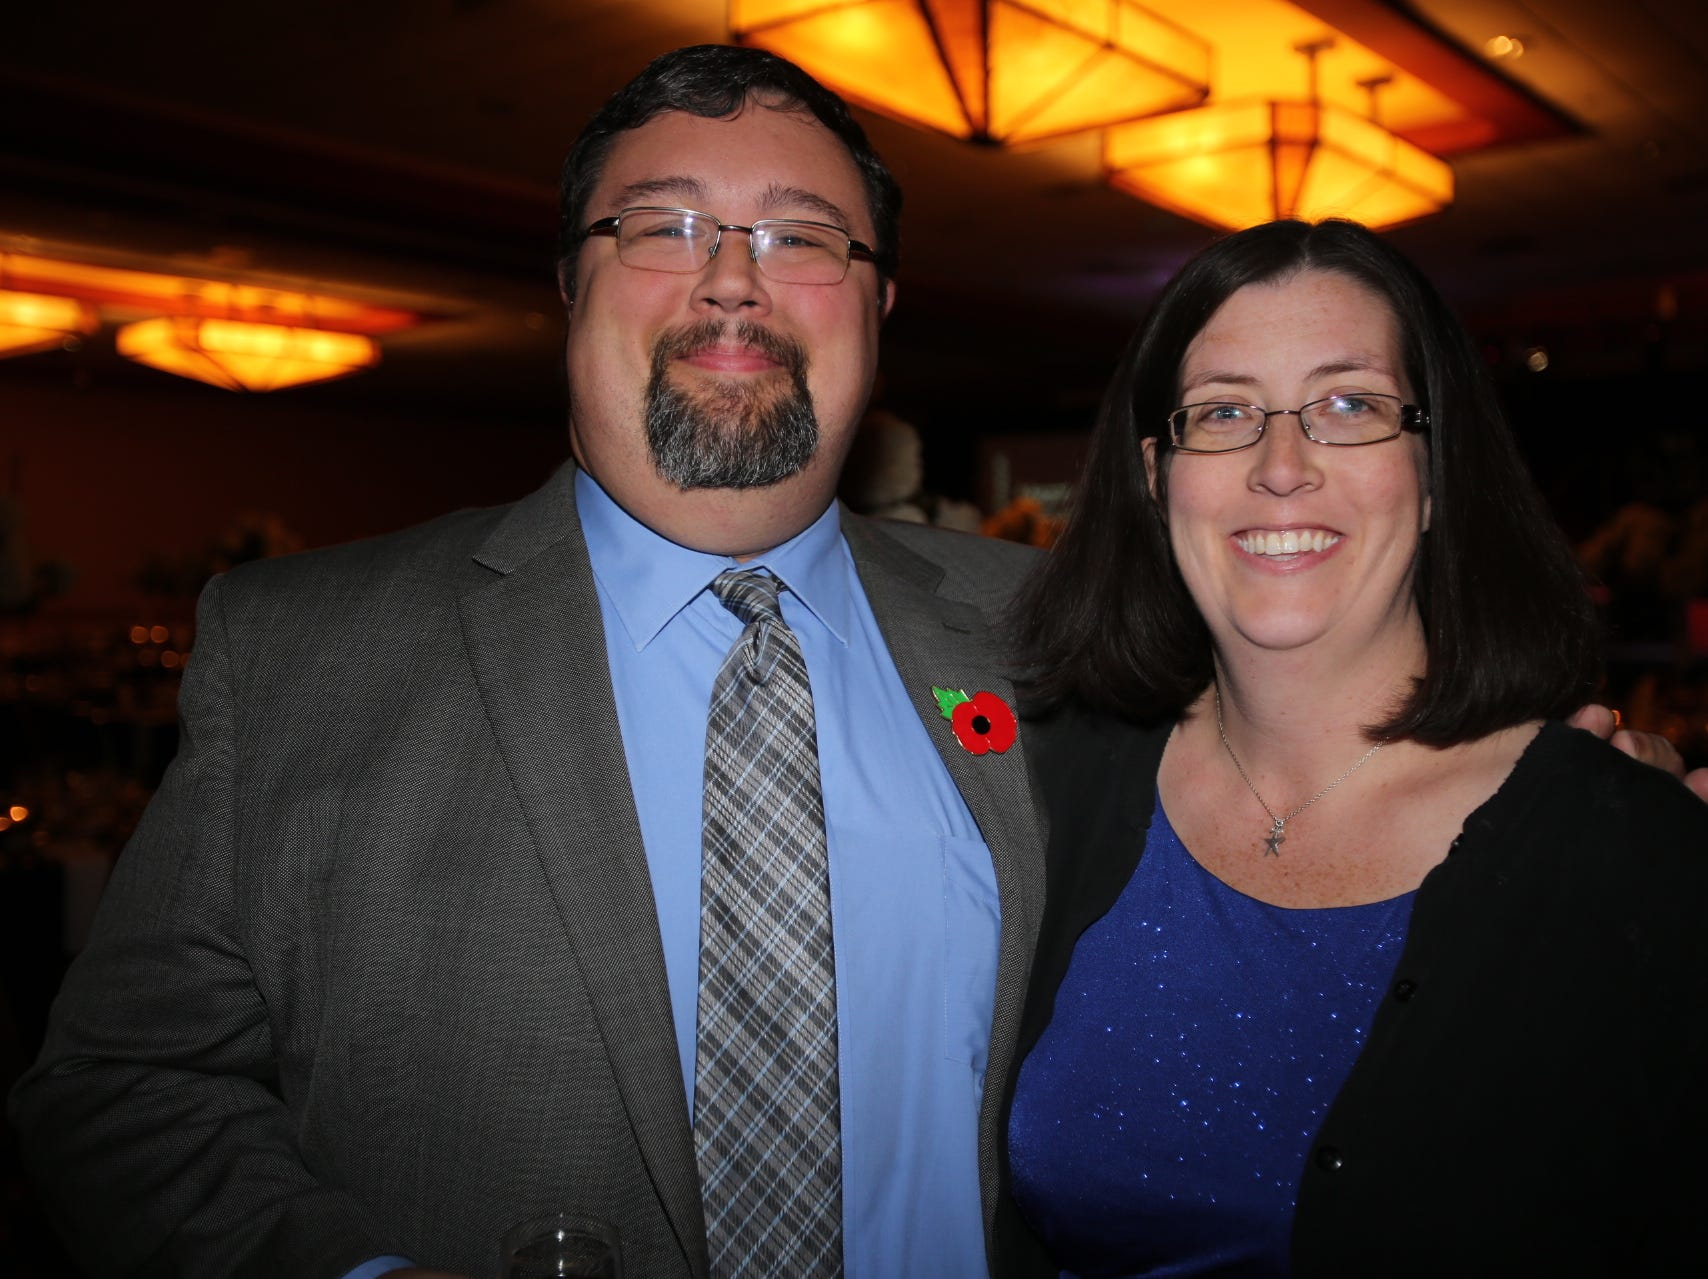 Reverend Chris Miller and Mary Miller